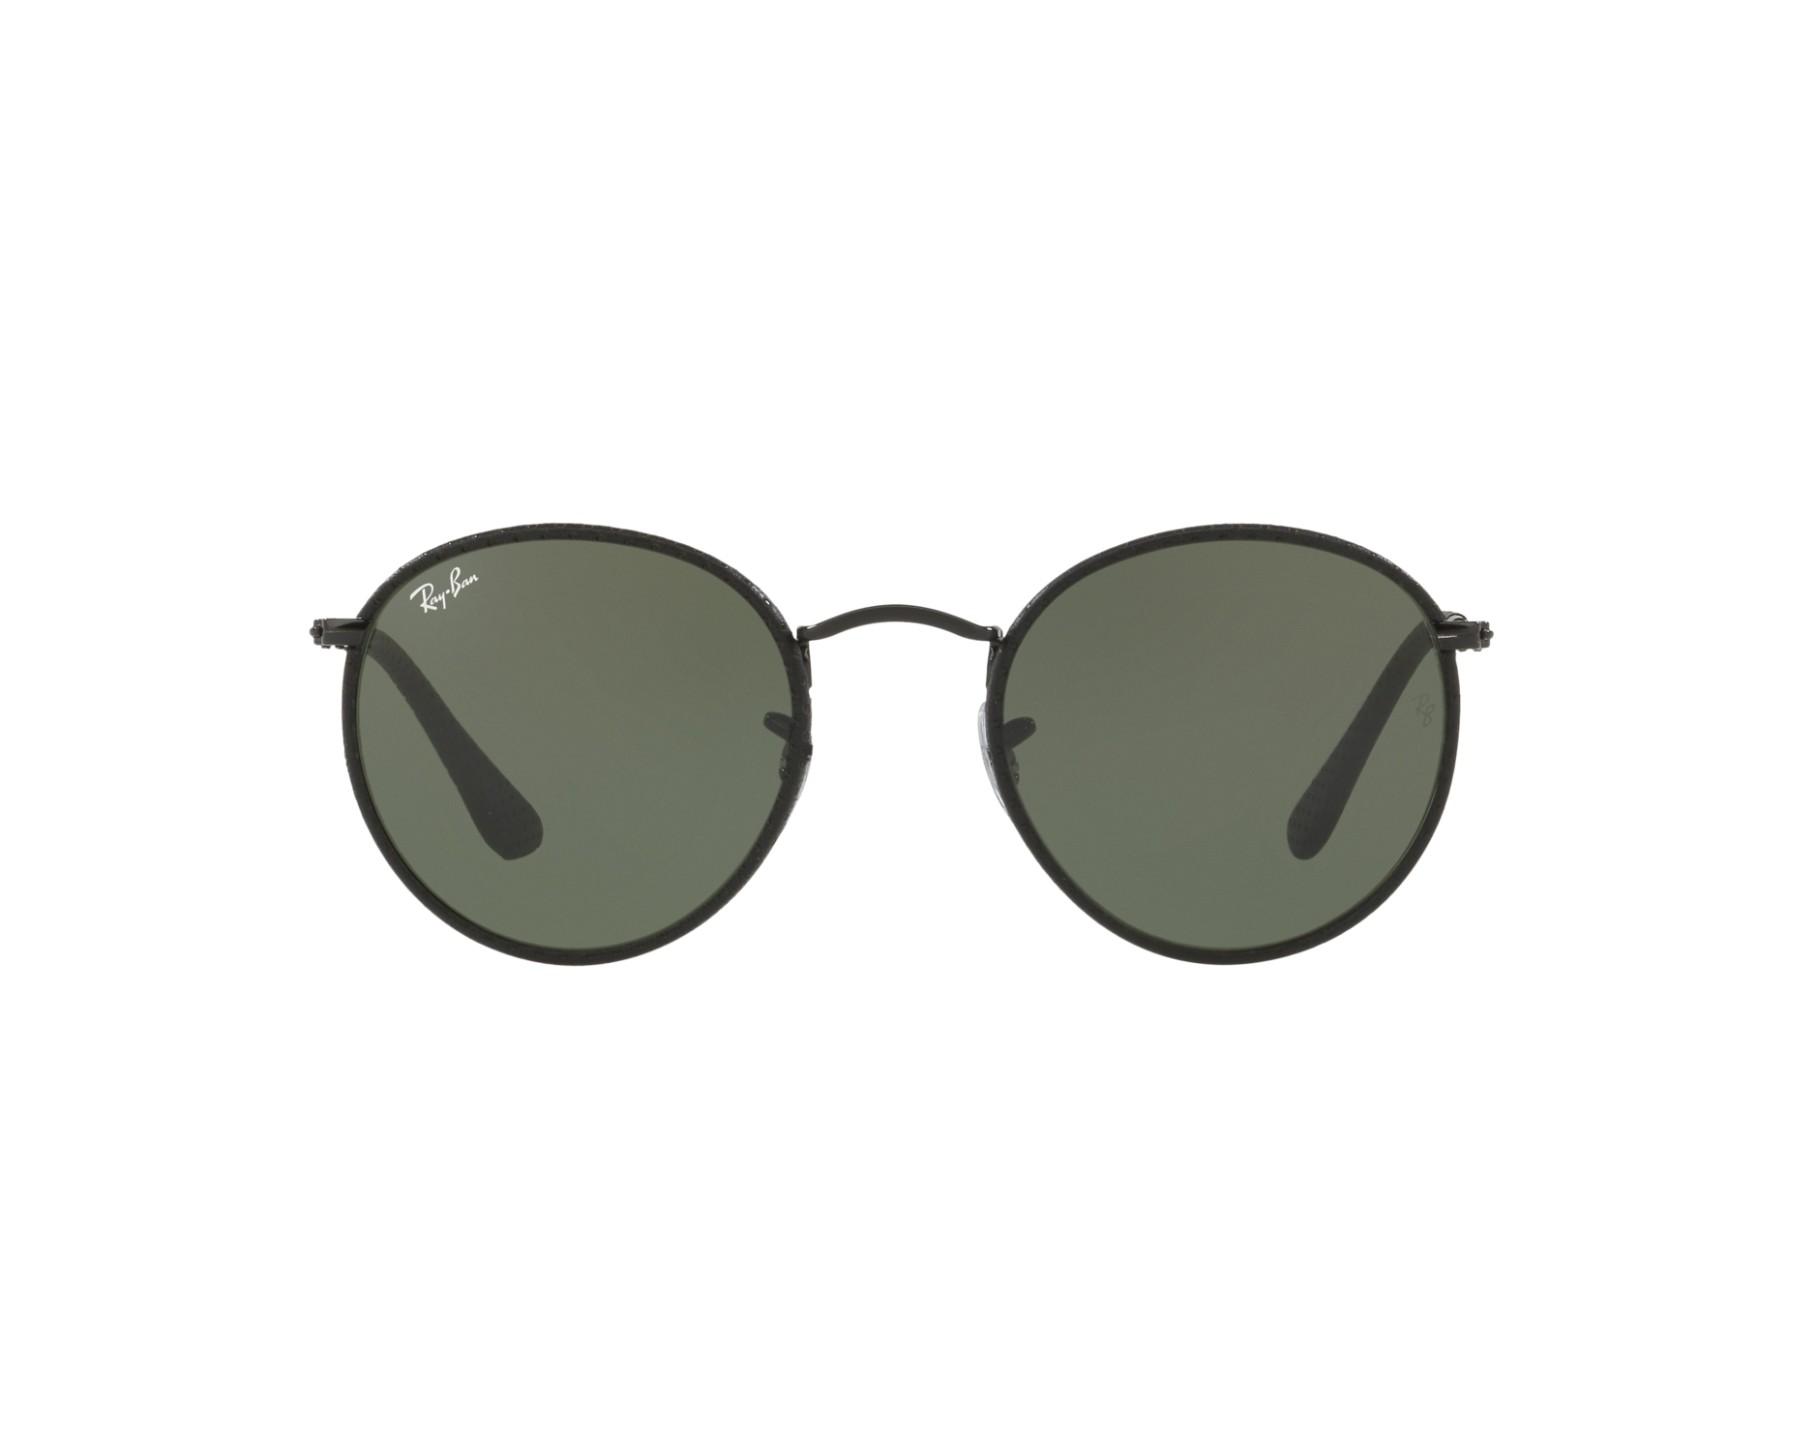 e7dfe4de6c4 Sunglasses Ray-Ban RB-3475-Q 9040 50-21 Black 360 degree